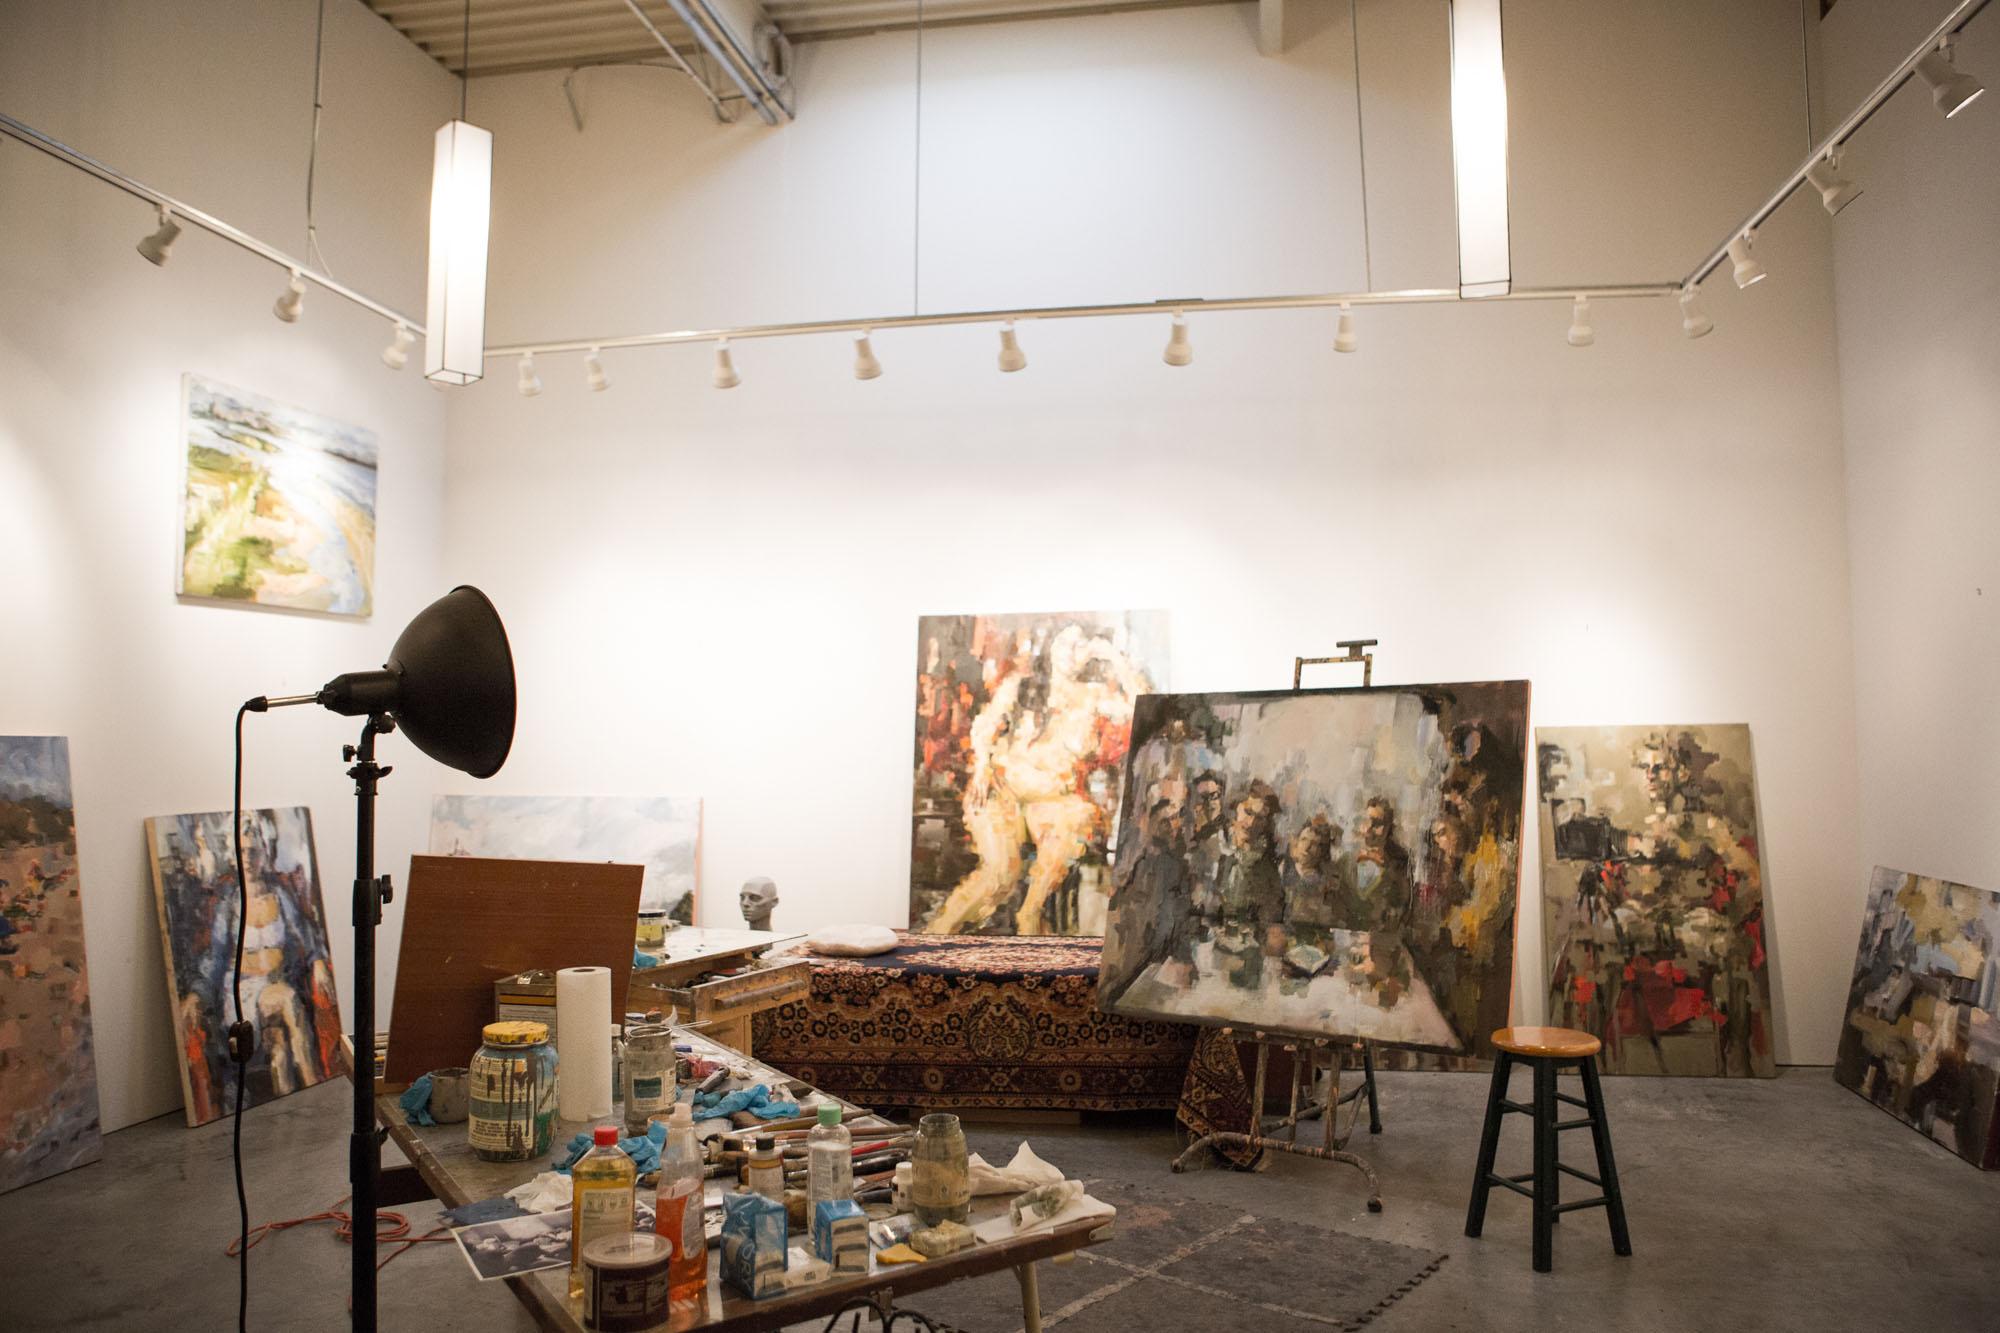 Michele-guilvazan-artist-studio-branding-photos-oil-painter96.jpg